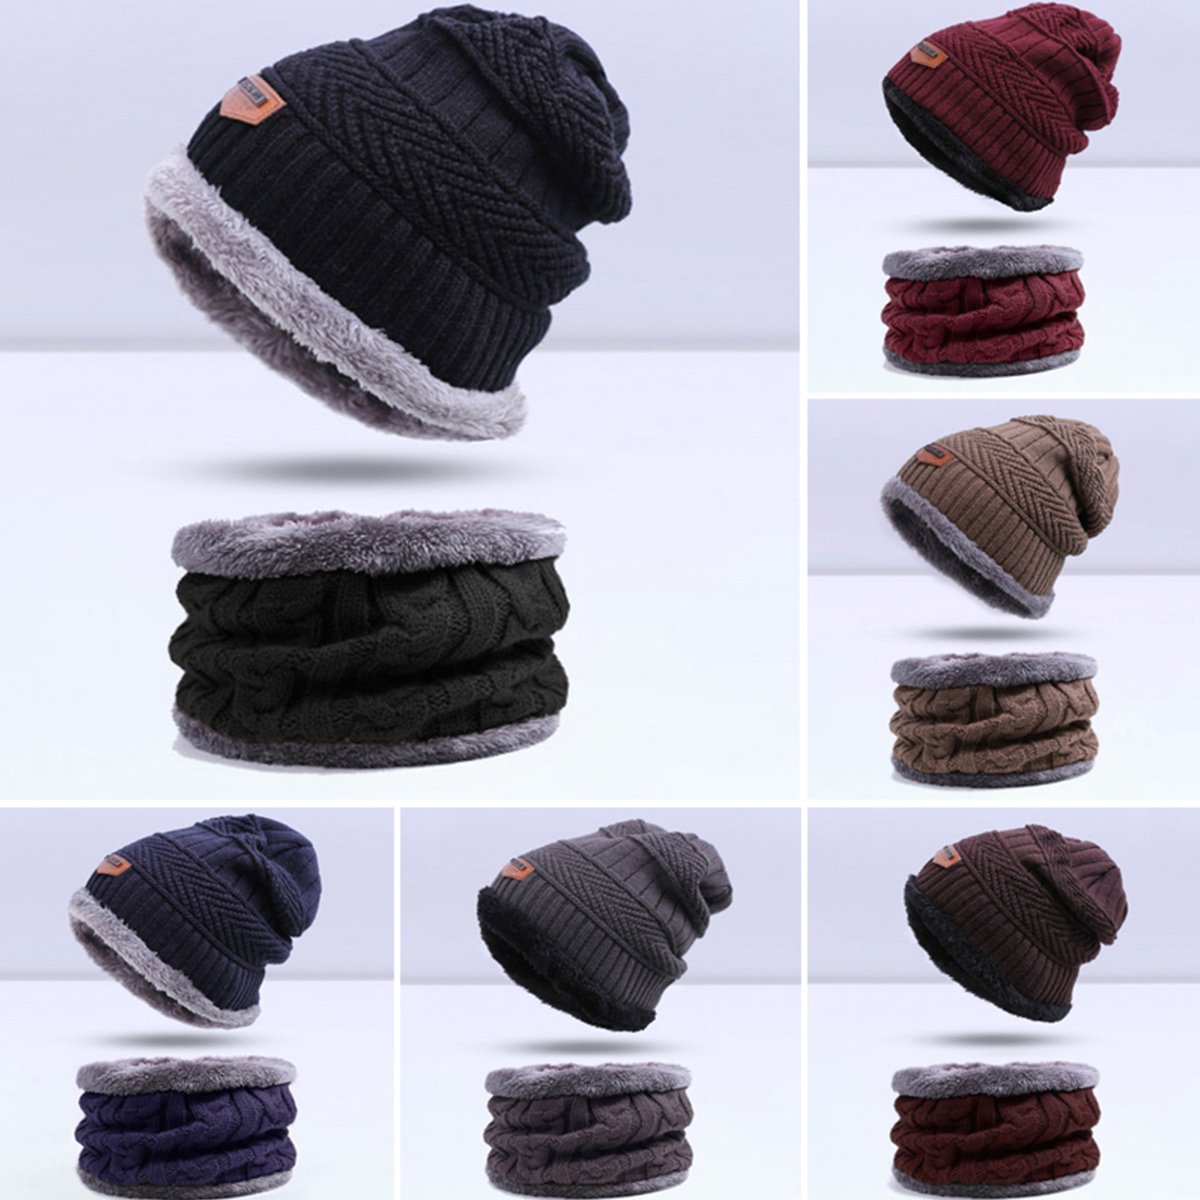 Garçon écharpe et gants Godea Ensemble bonnet